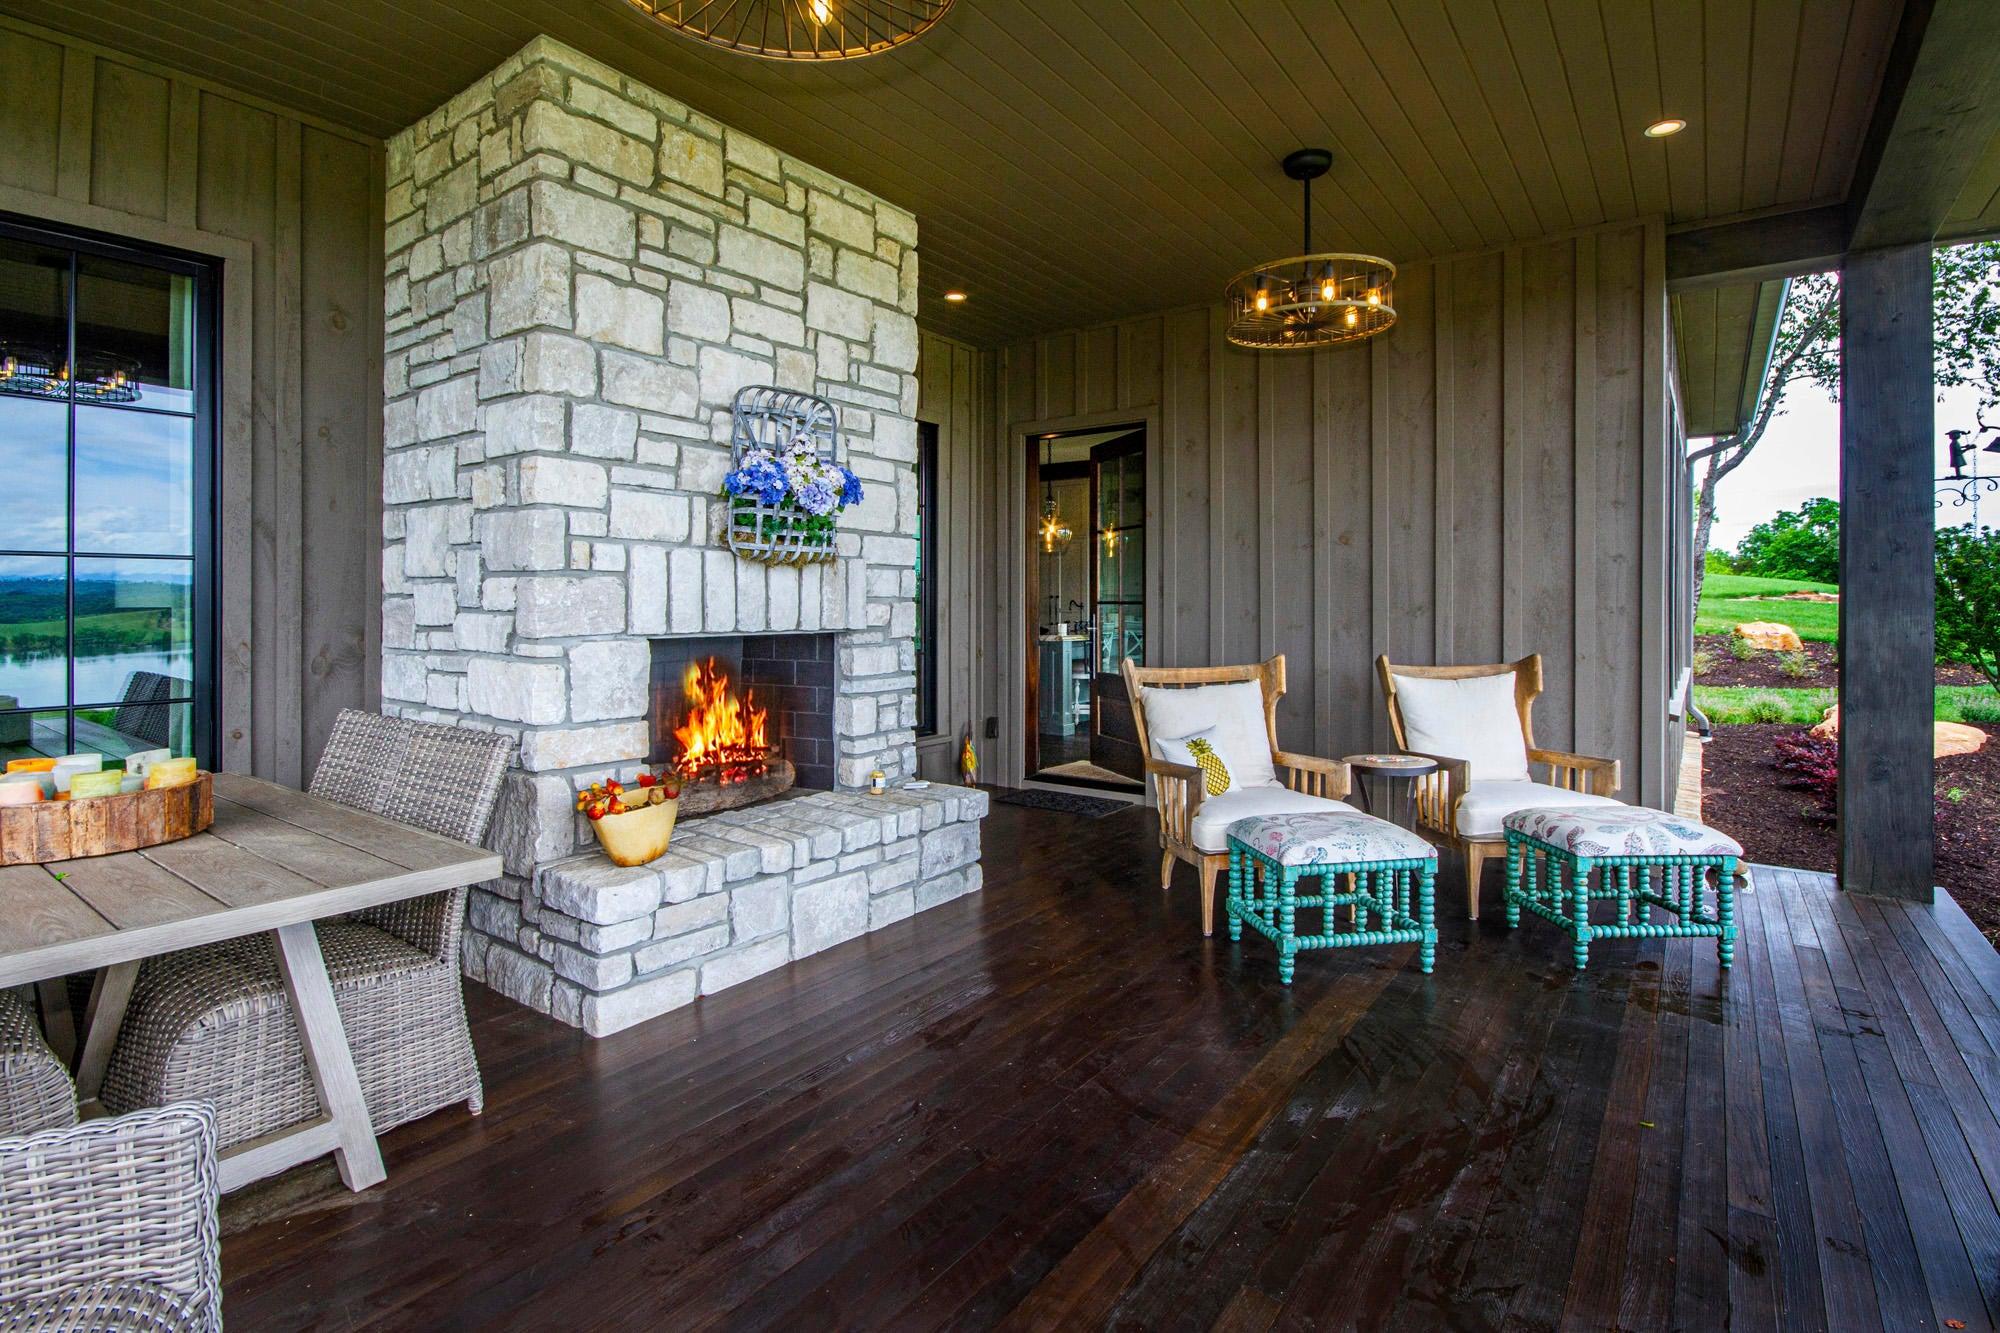 Wood burning fireplace o deck